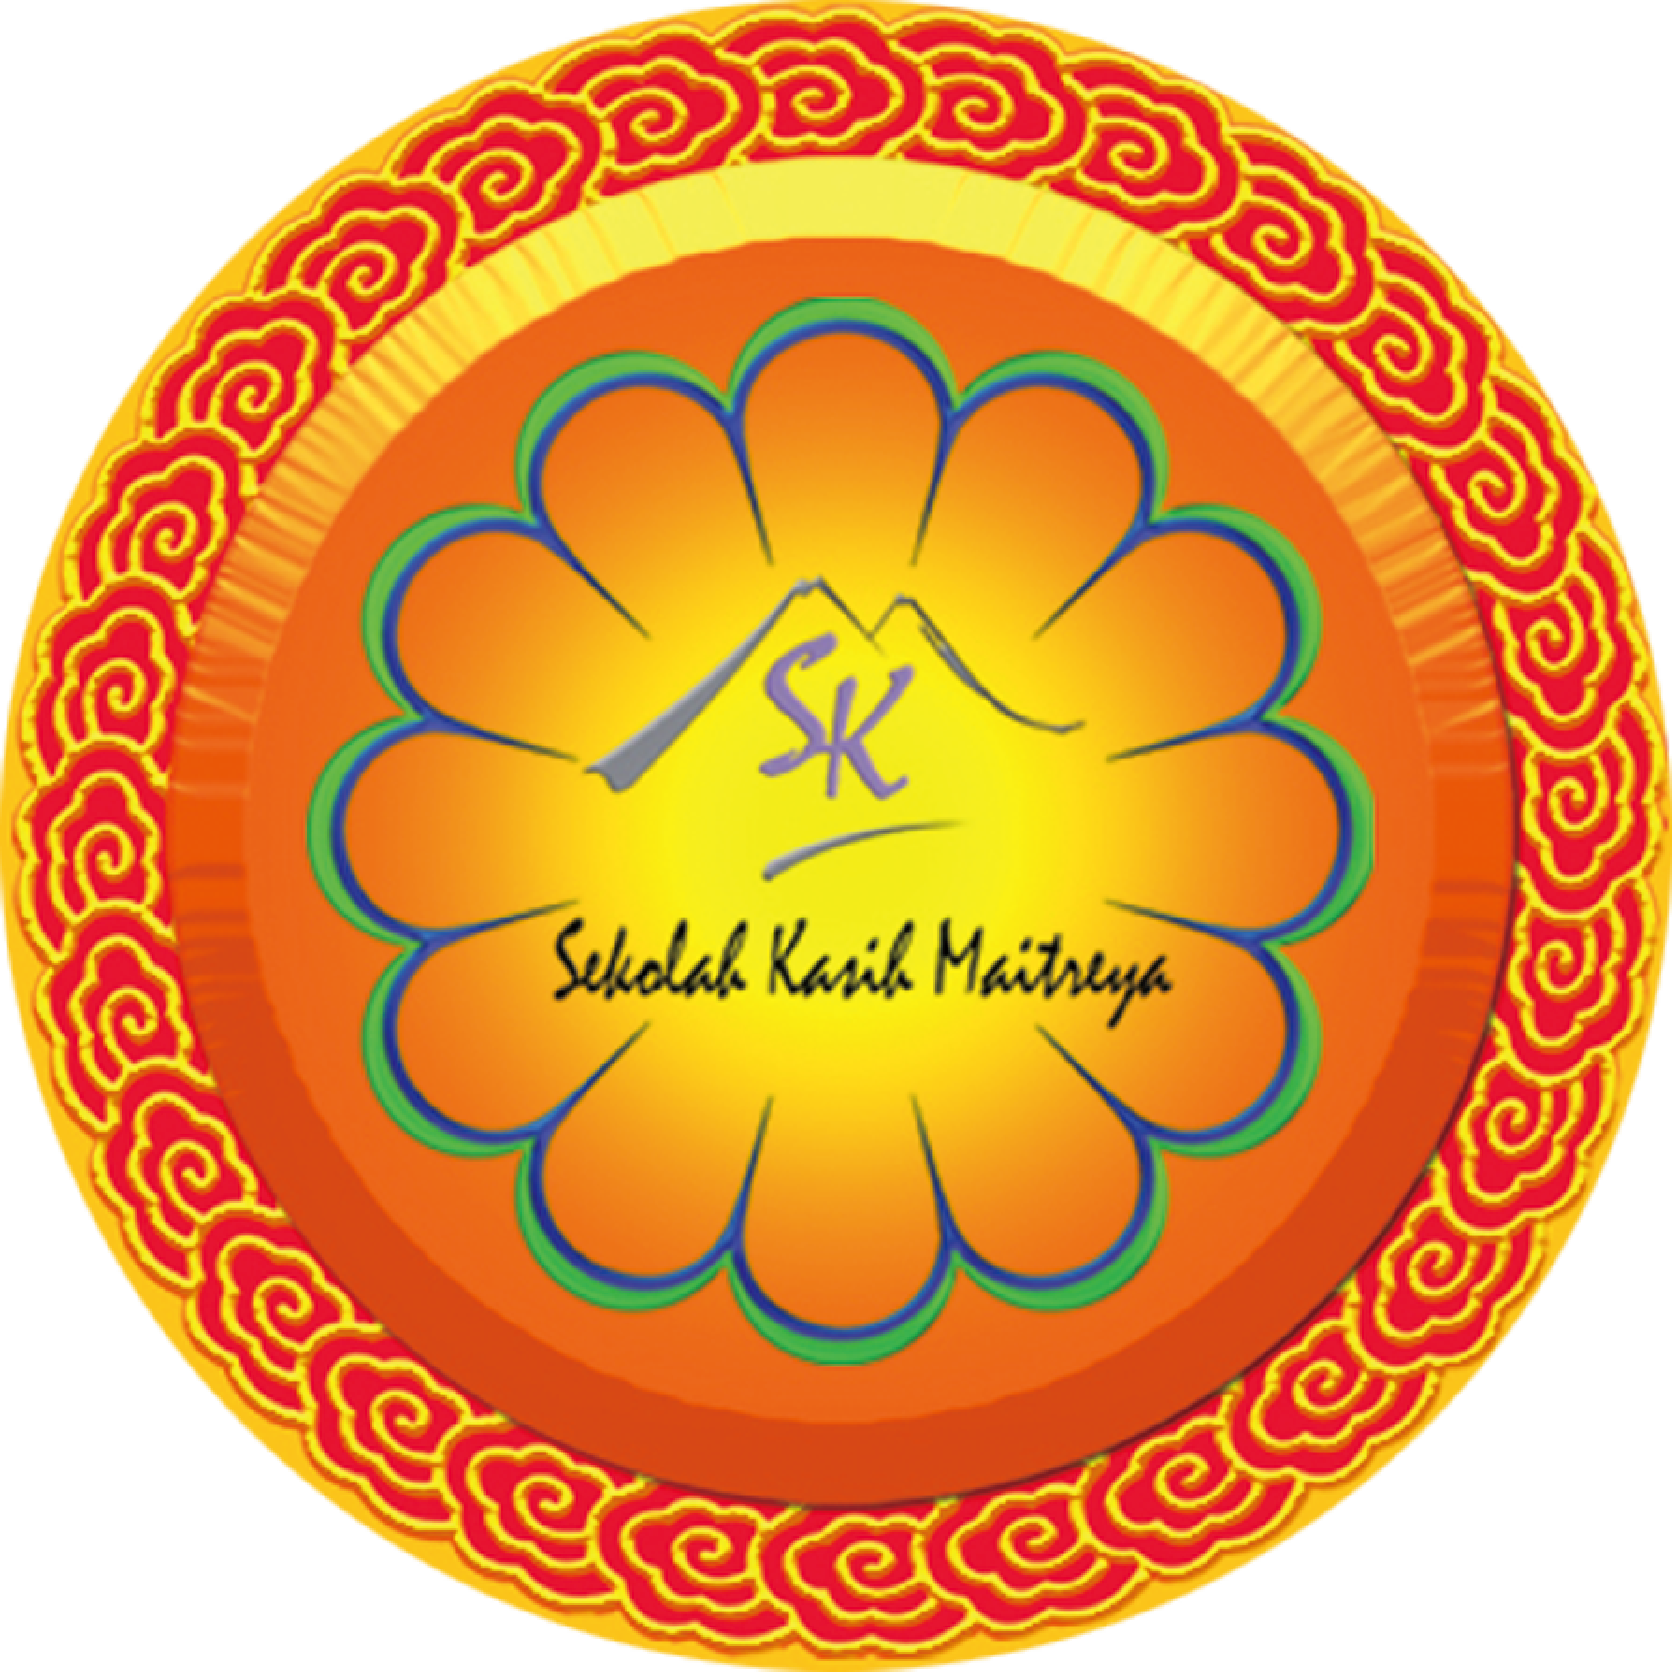 SMKS Kasih Maitreya